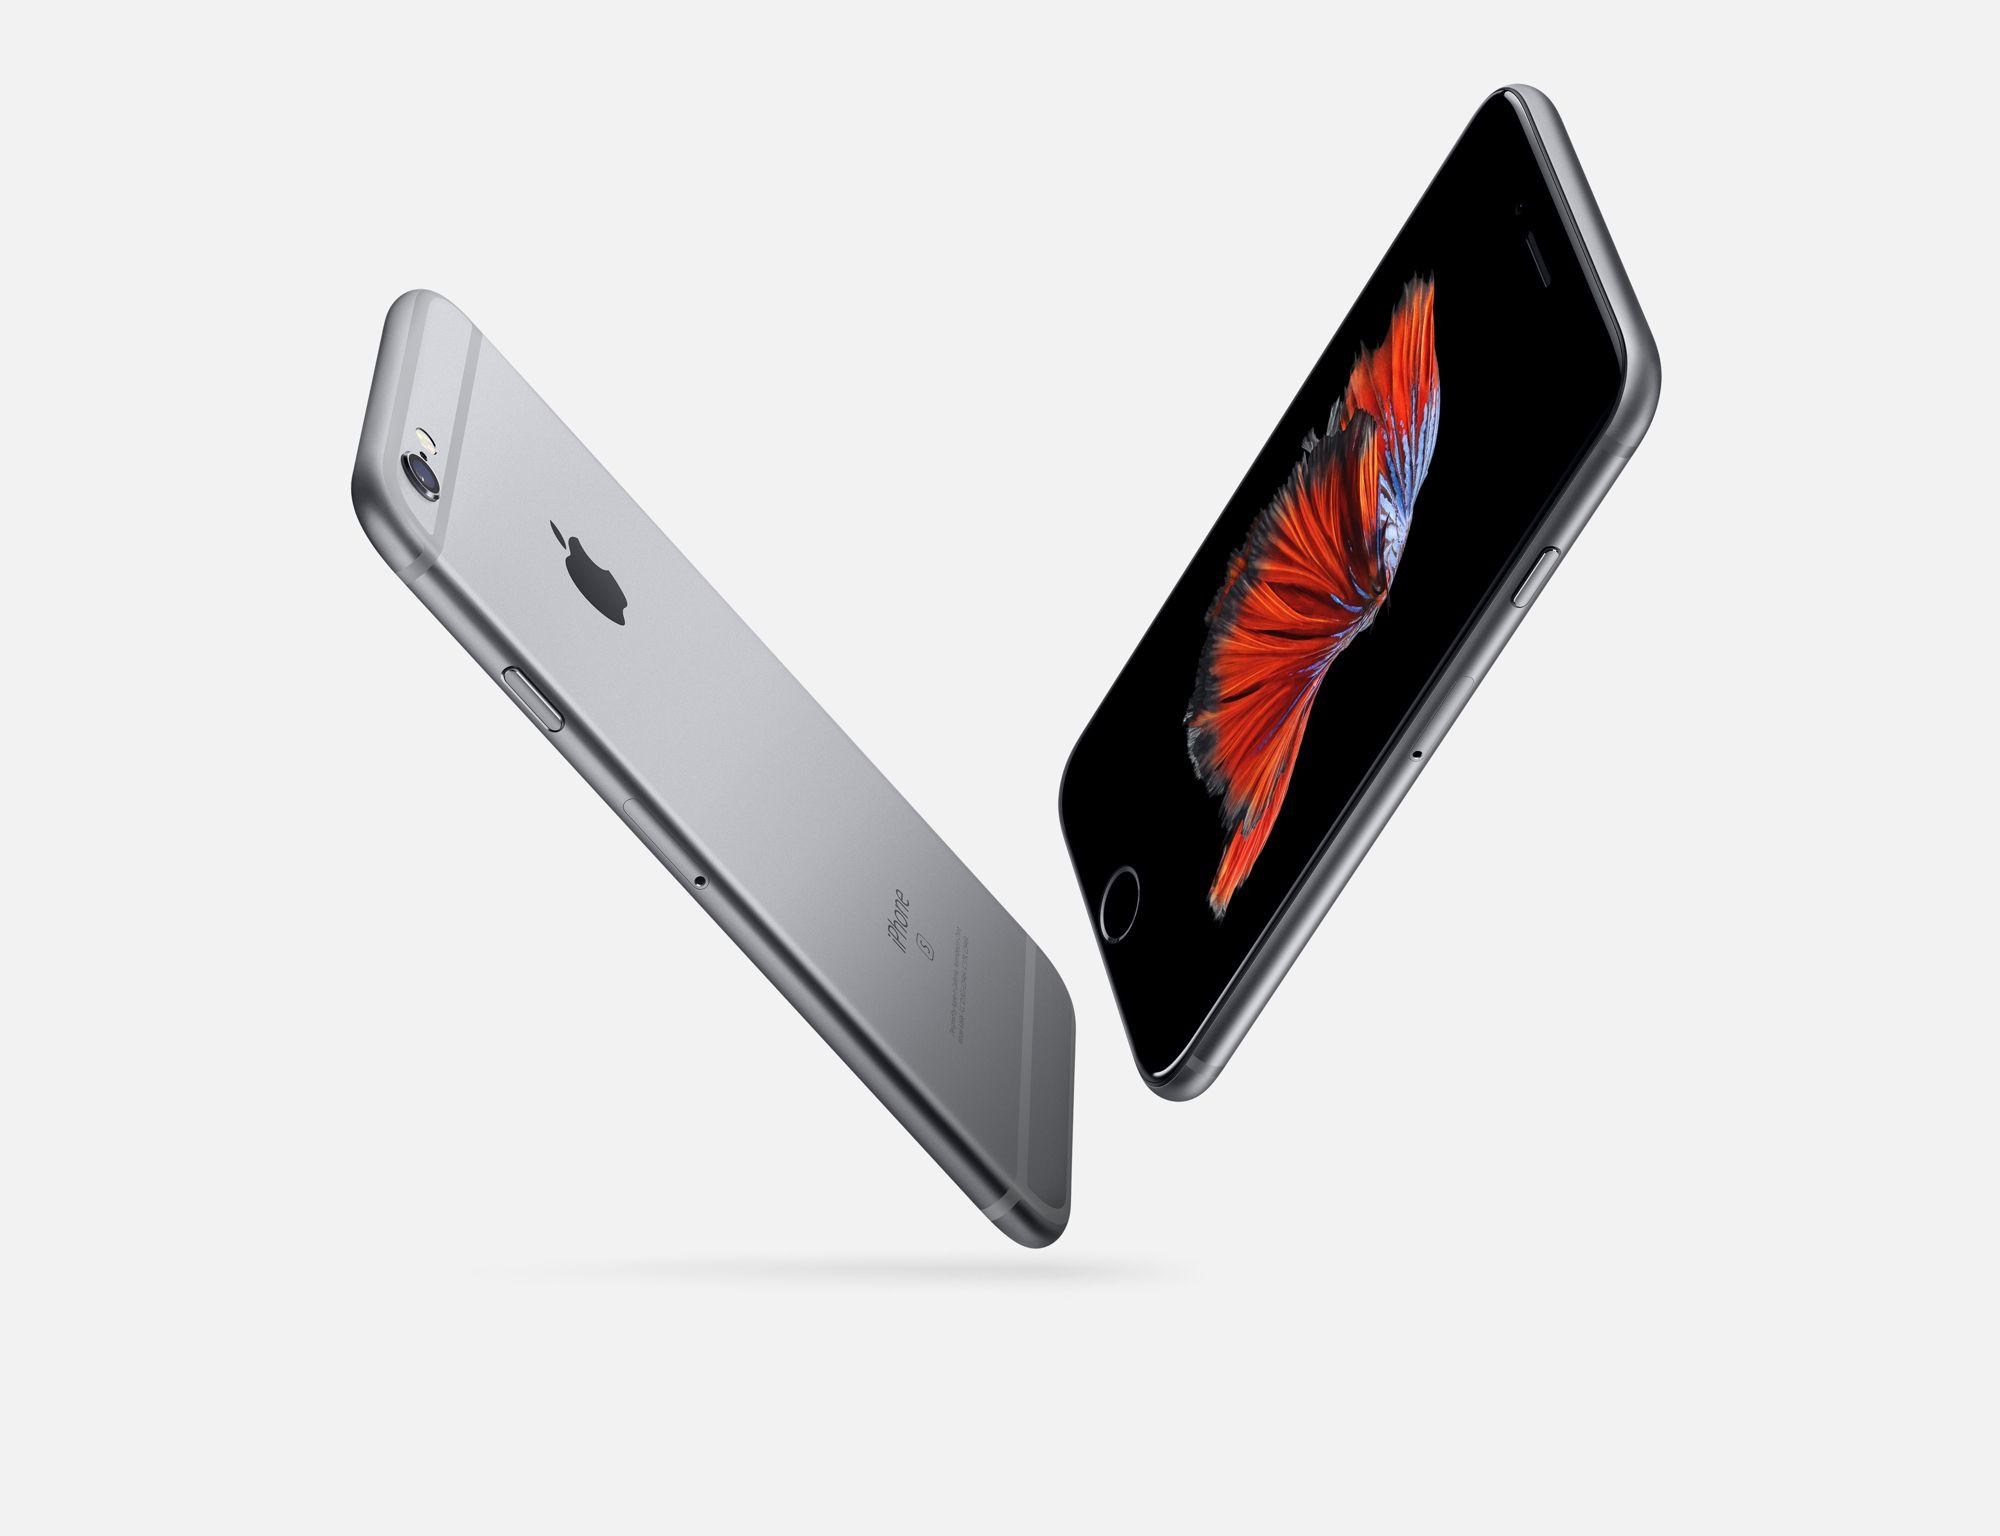 Apple iPhone 6S Plus - 32GB Space Gray   Art   Craft 404cf4dc9b54